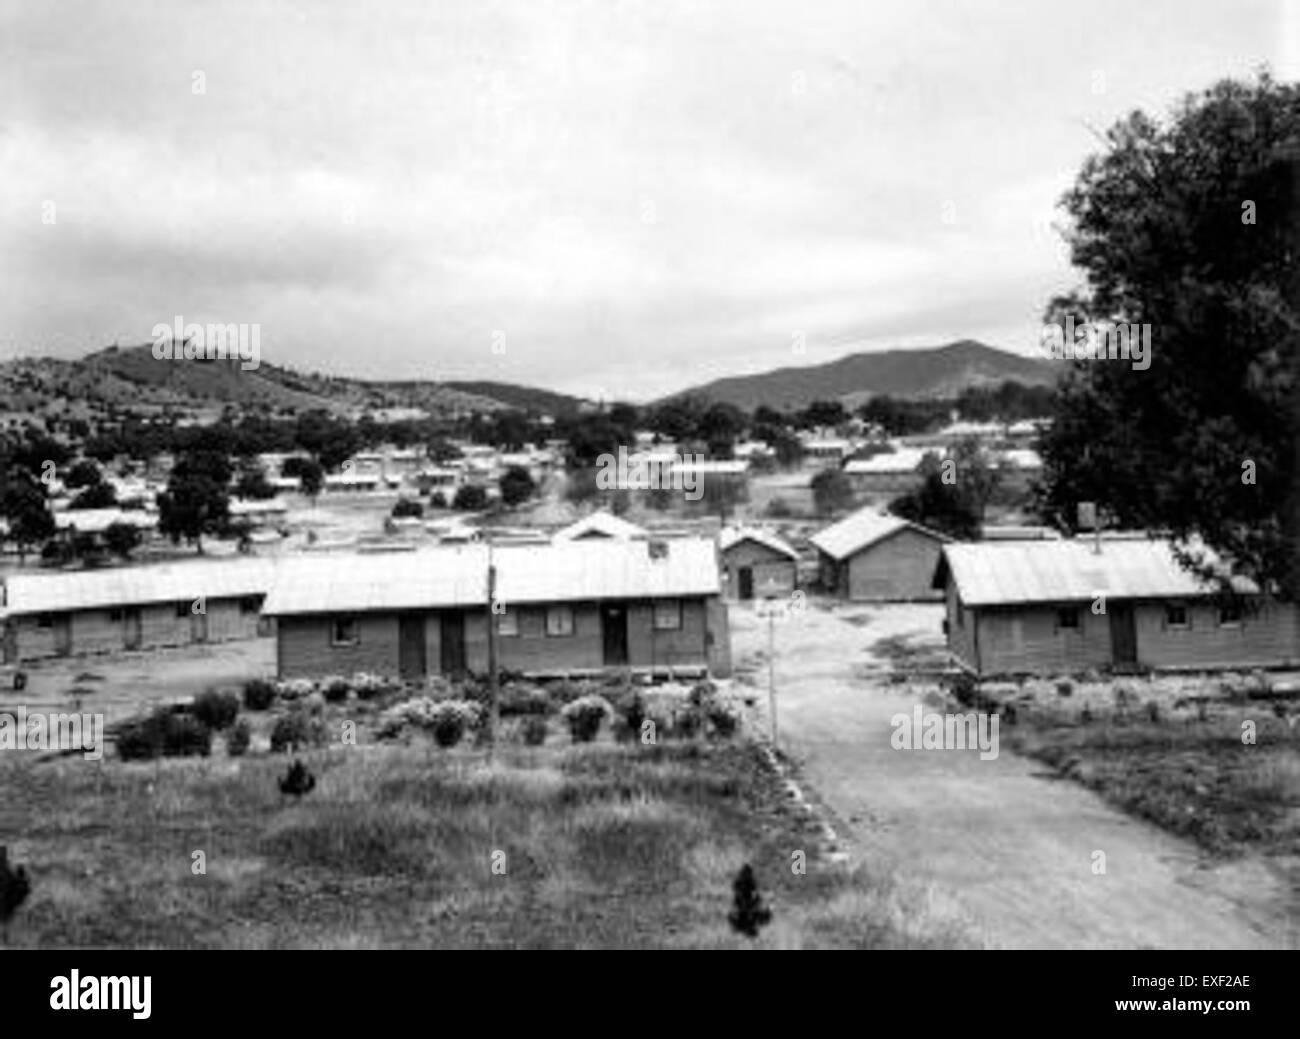 Immigrantenkamp Bonegilla in Australië - Stock Image